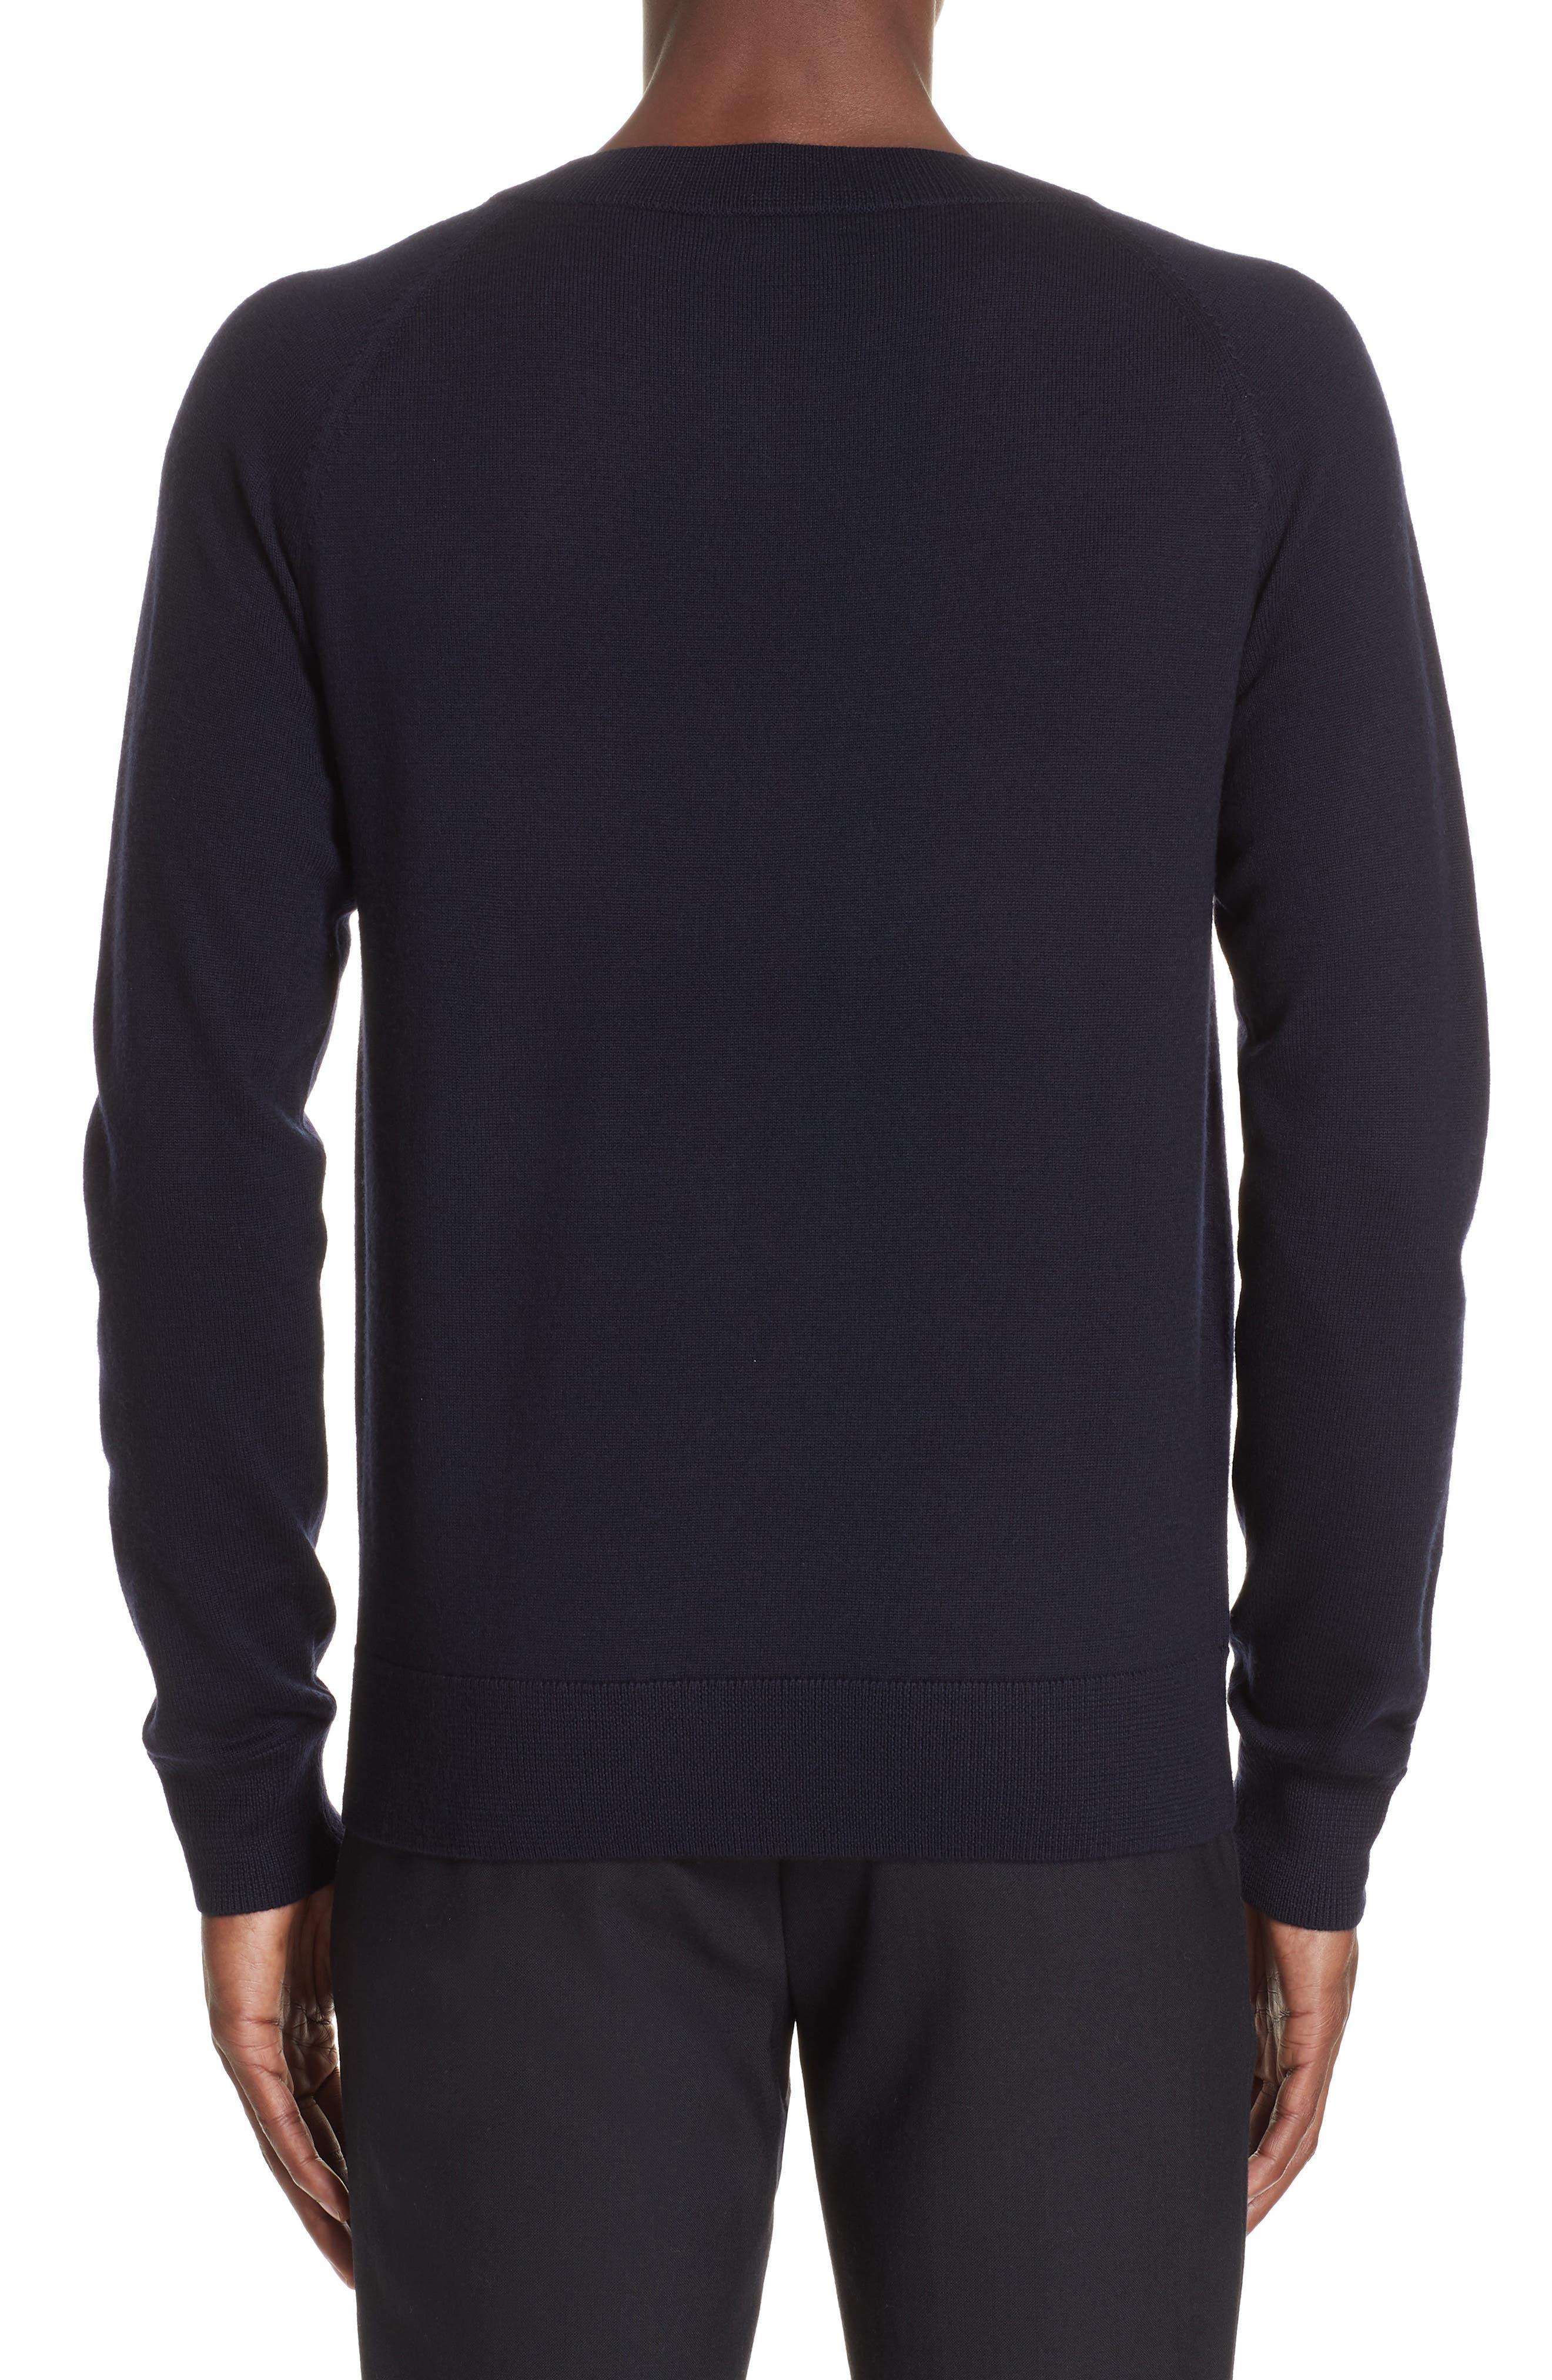 Mimic Raglan Sweater,                             Alternate thumbnail 2, color,                             NAVY